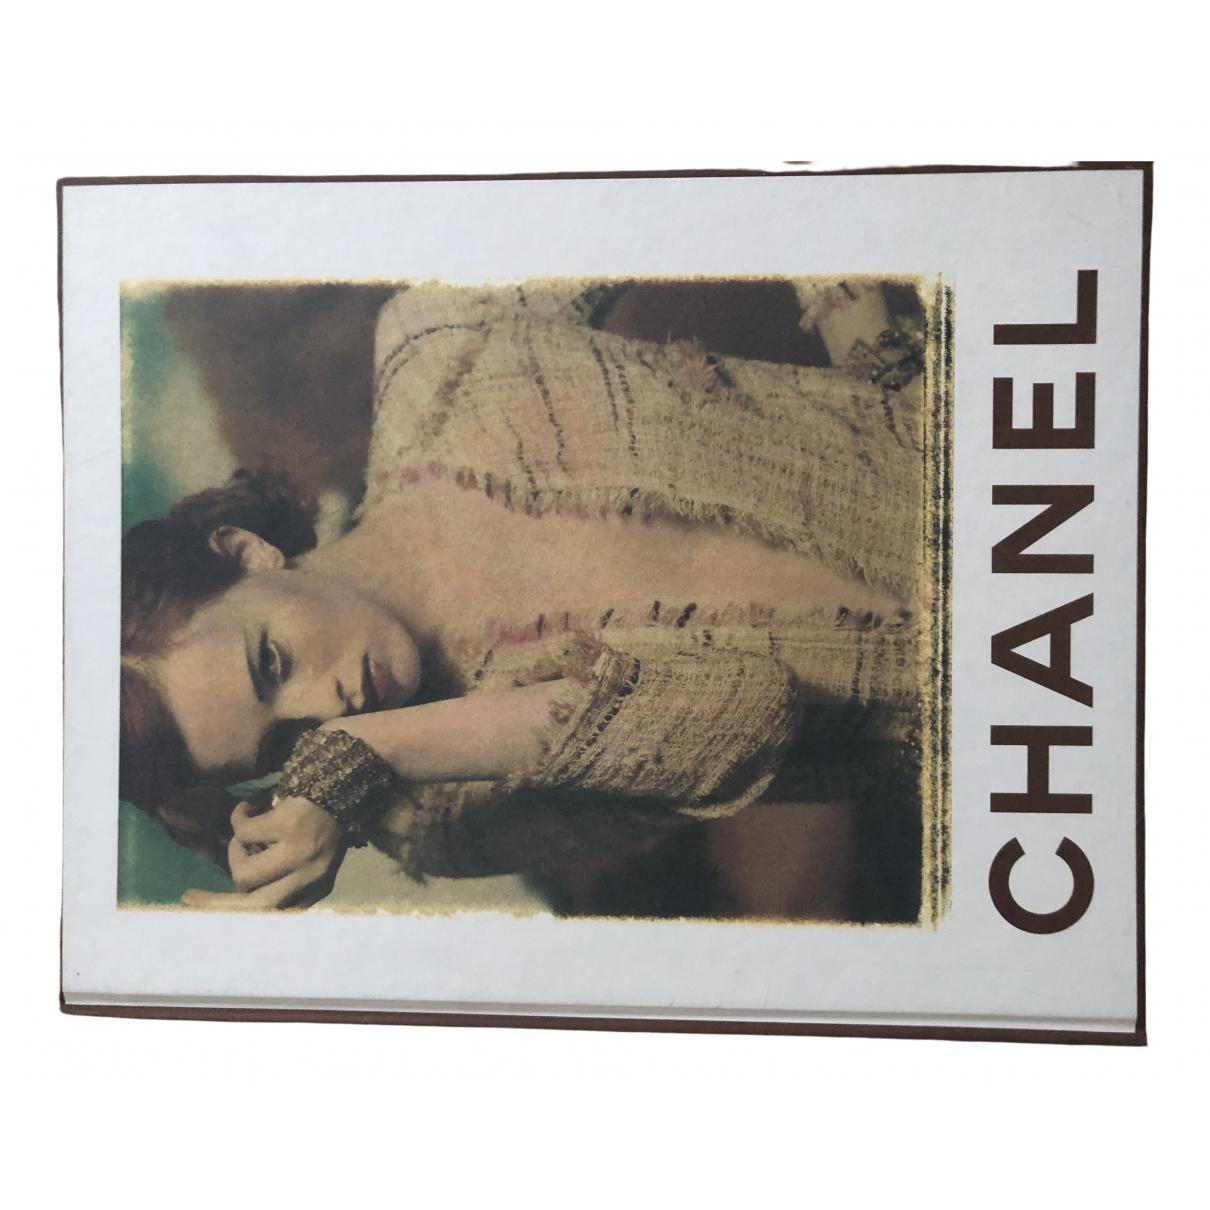 Moda Chanel